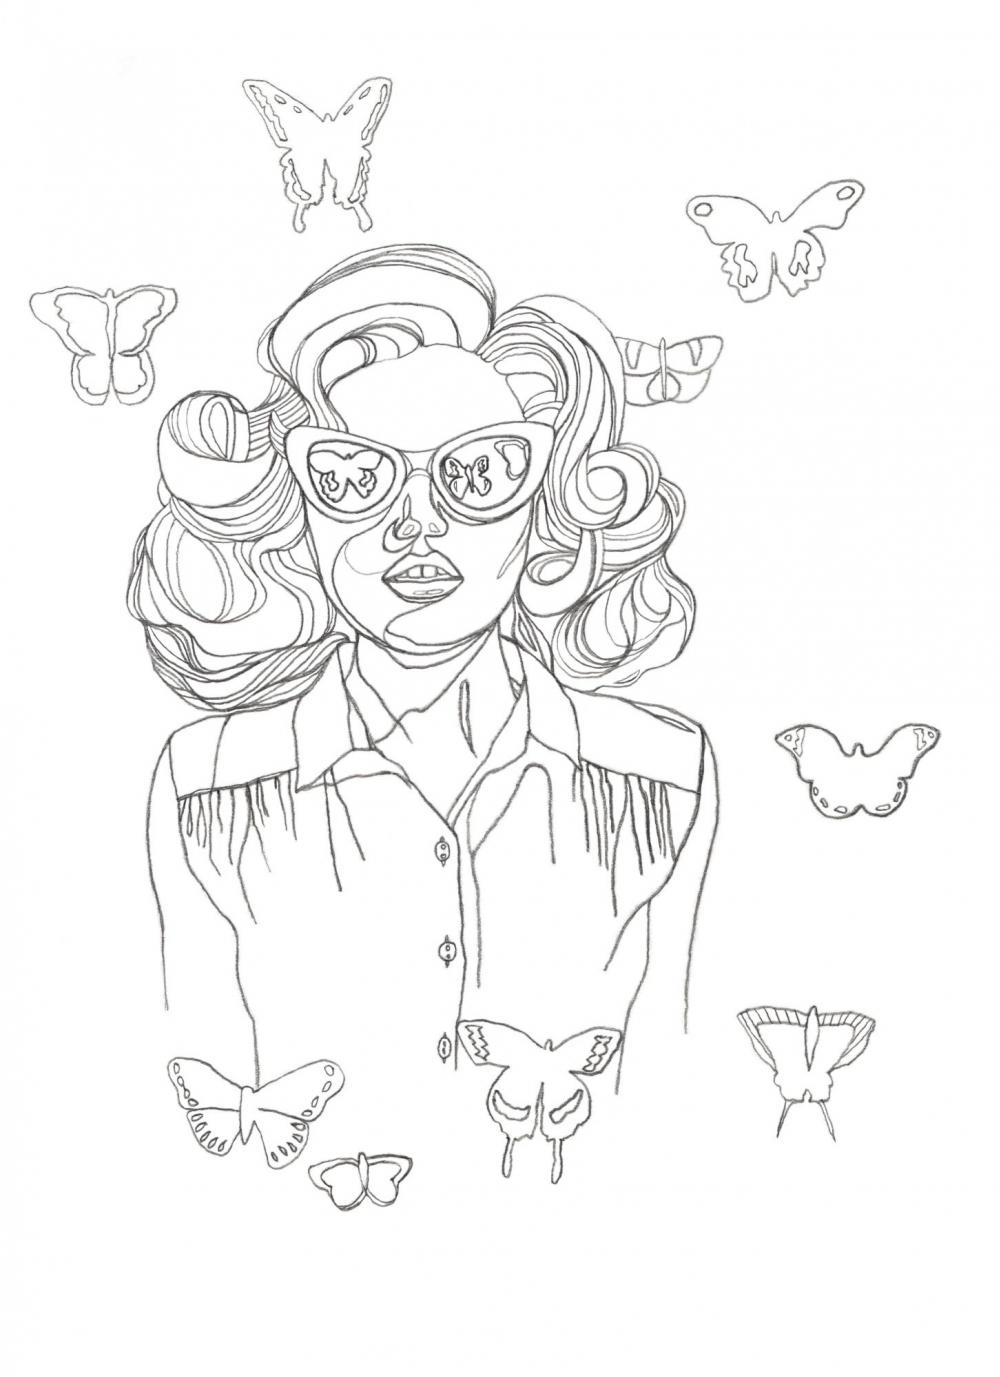 Illustrations And Drawings Deborah Kraaijeveld